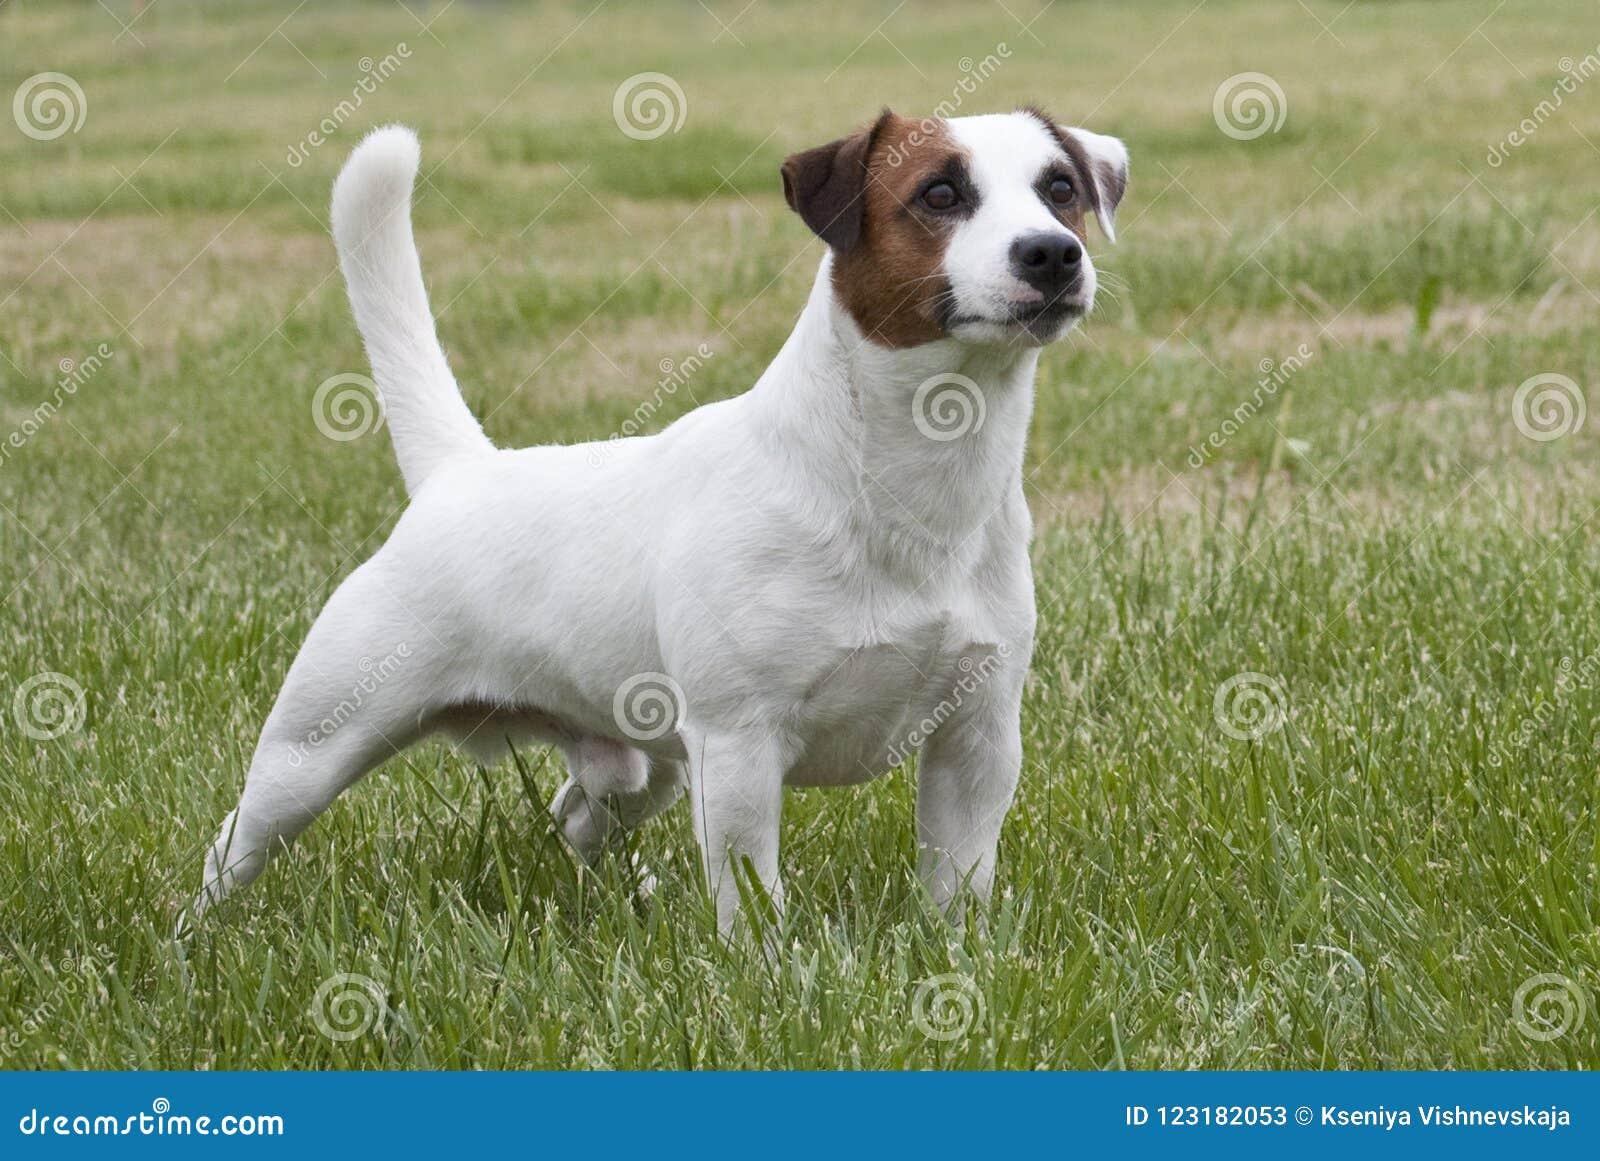 Biały i brown Jack Russell terier